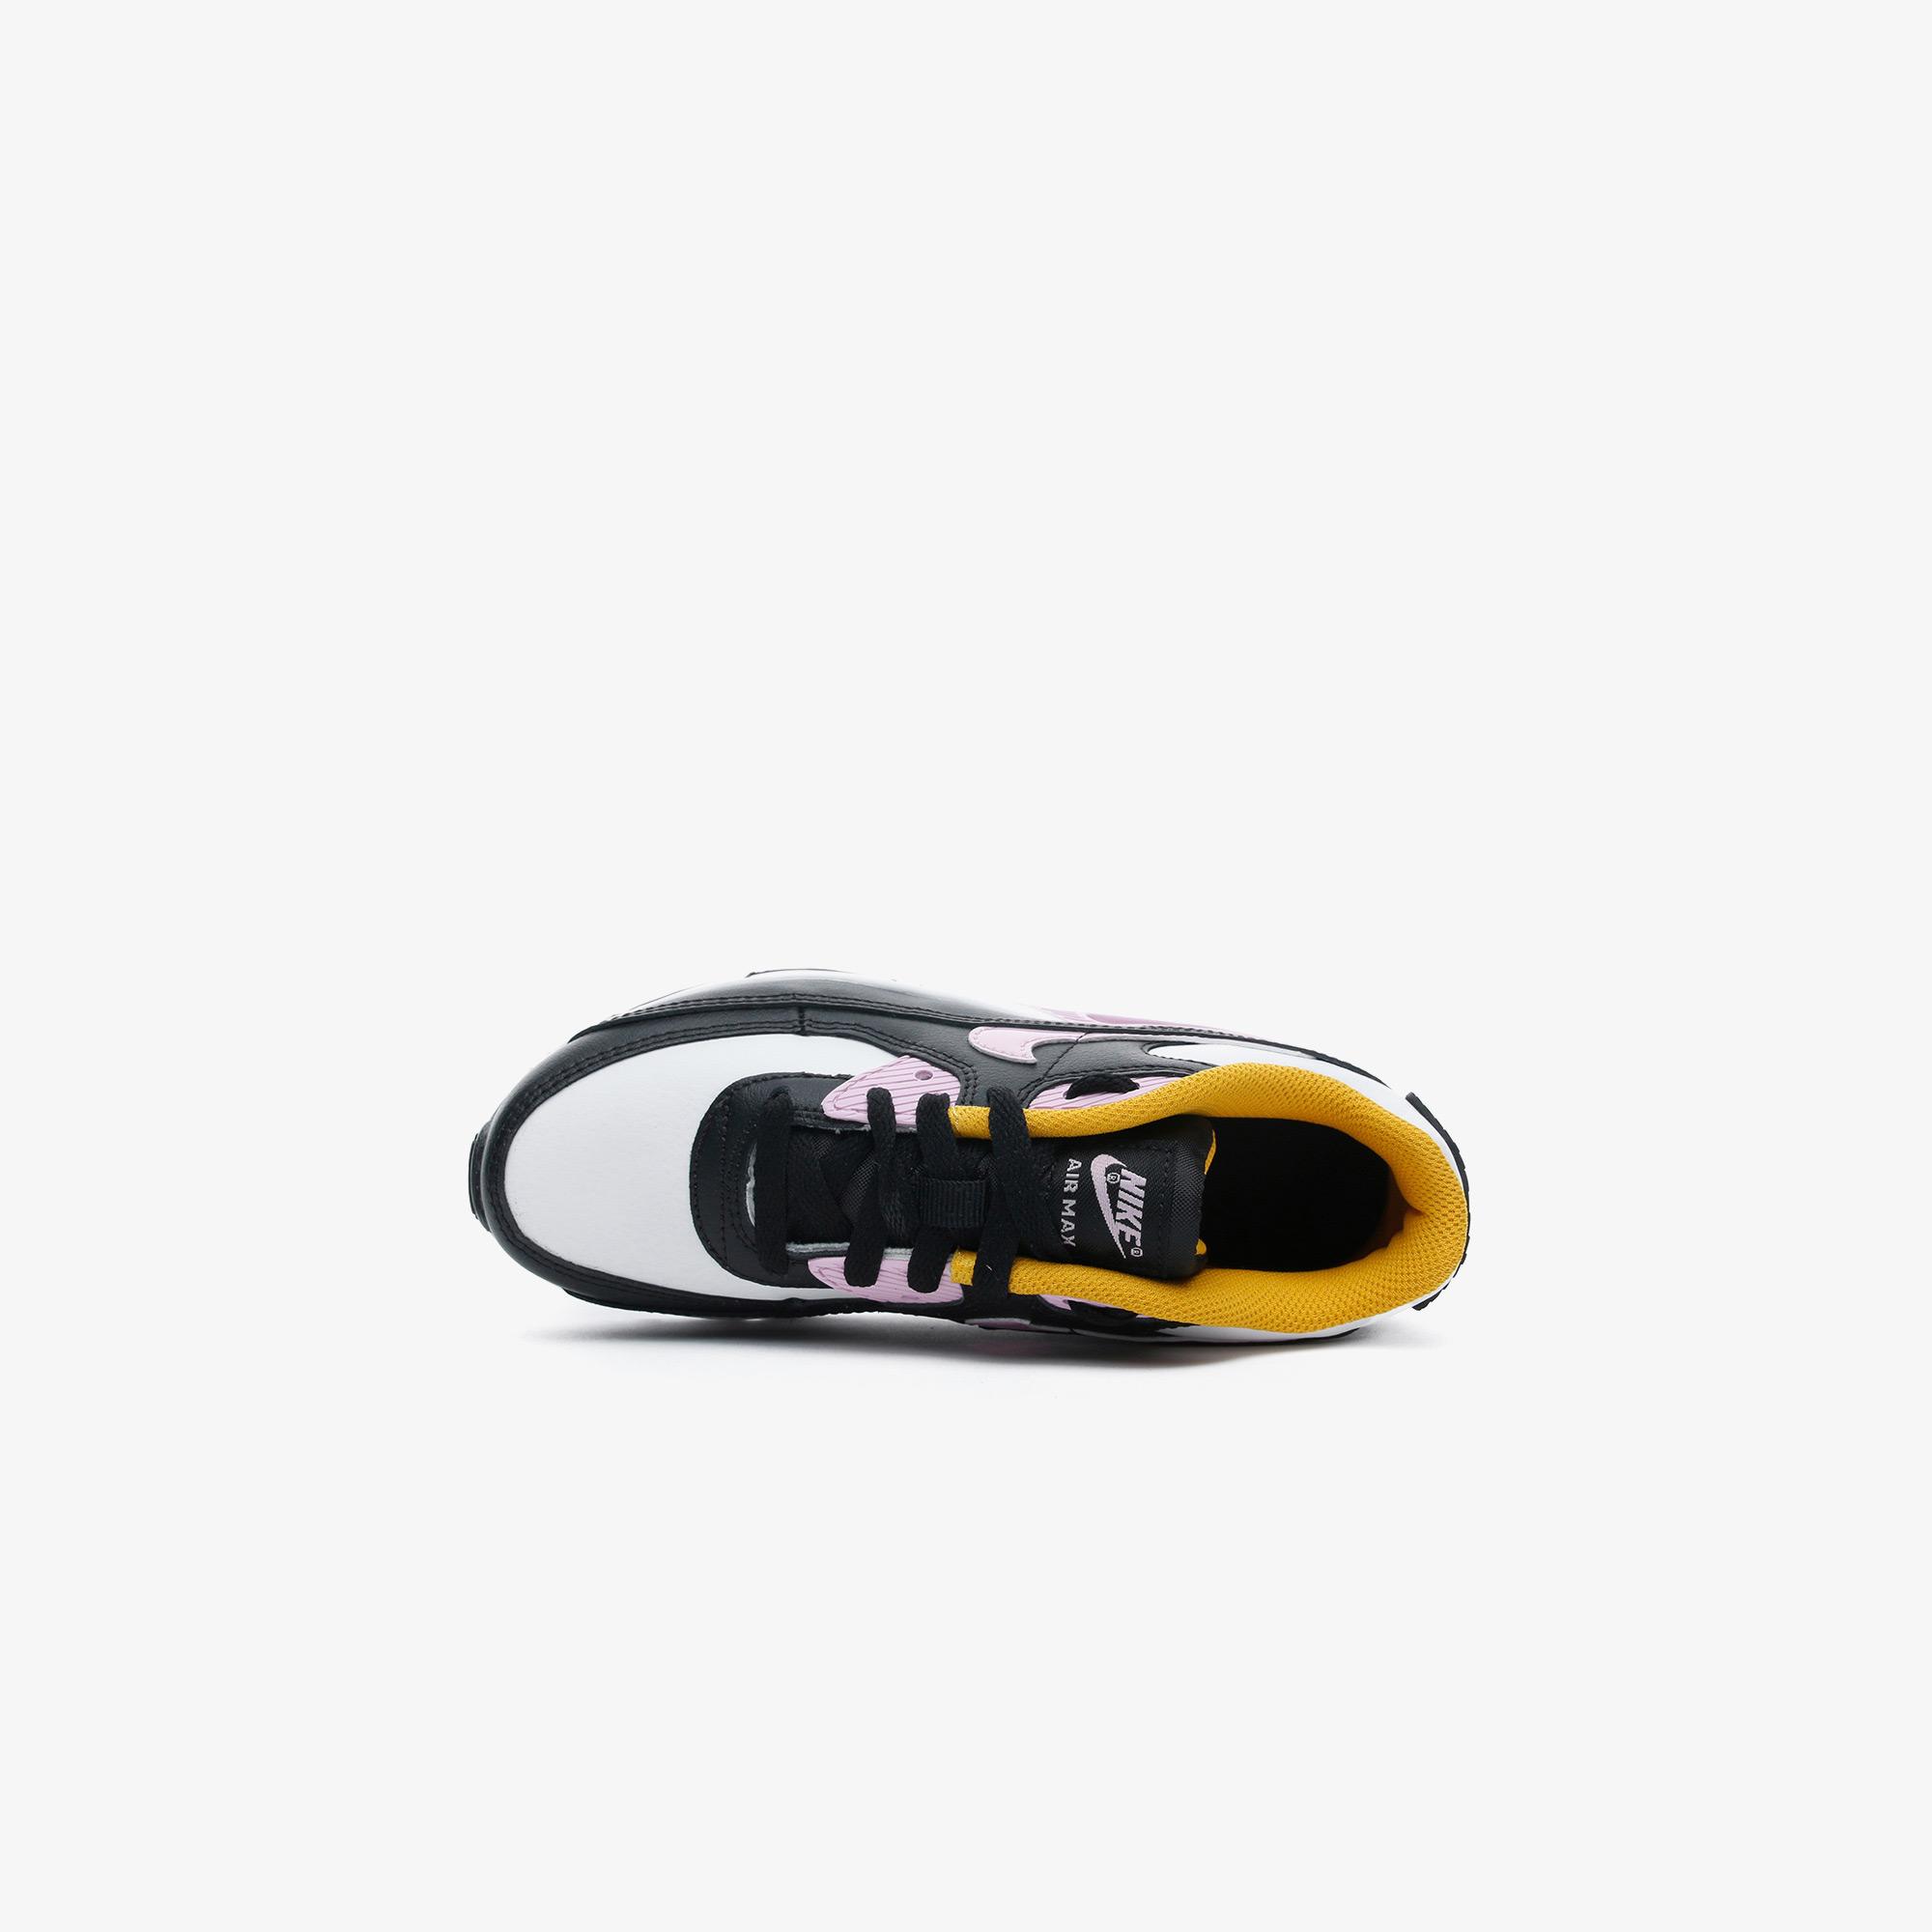 Nike Air Max 90 LTR Çocuk Siyah-Mor Spor Ayakkabı